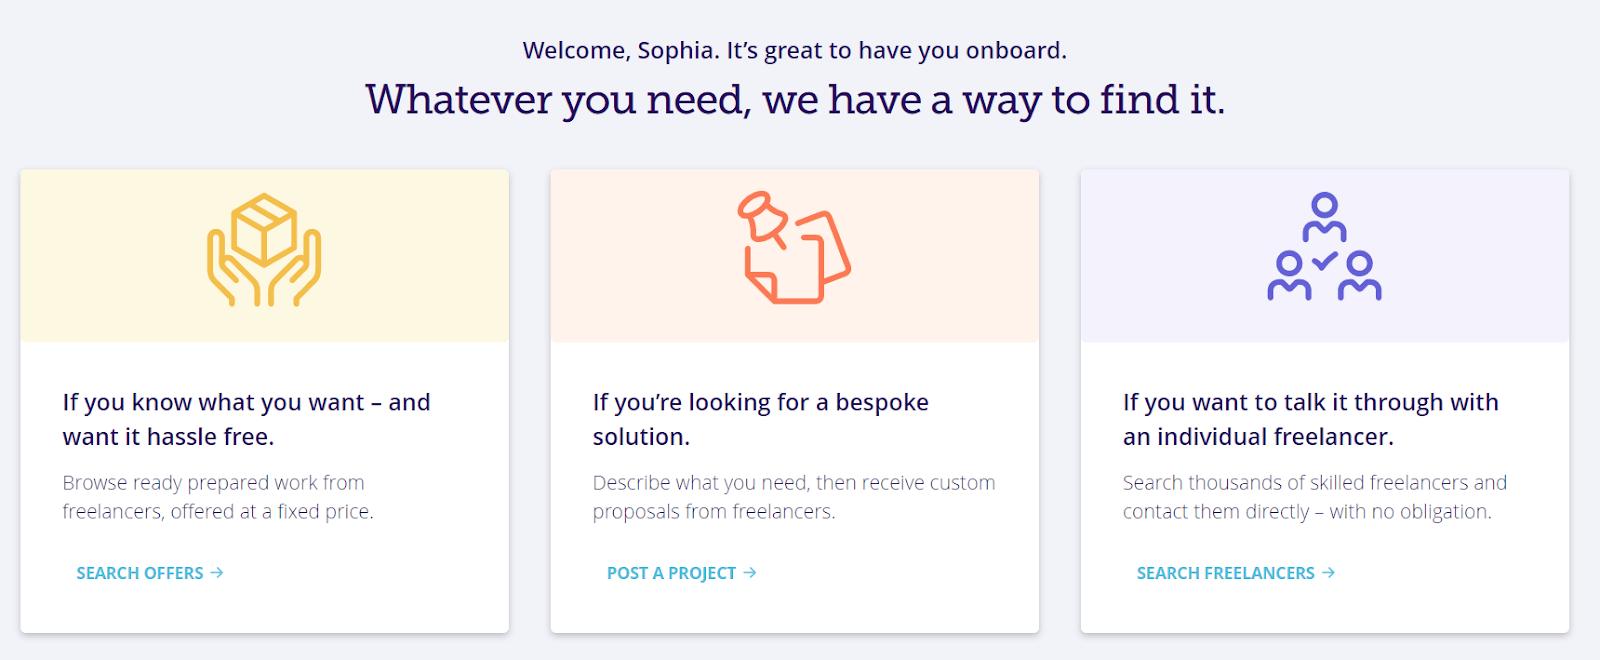 PeoplePerHour's options for browsing freelancers